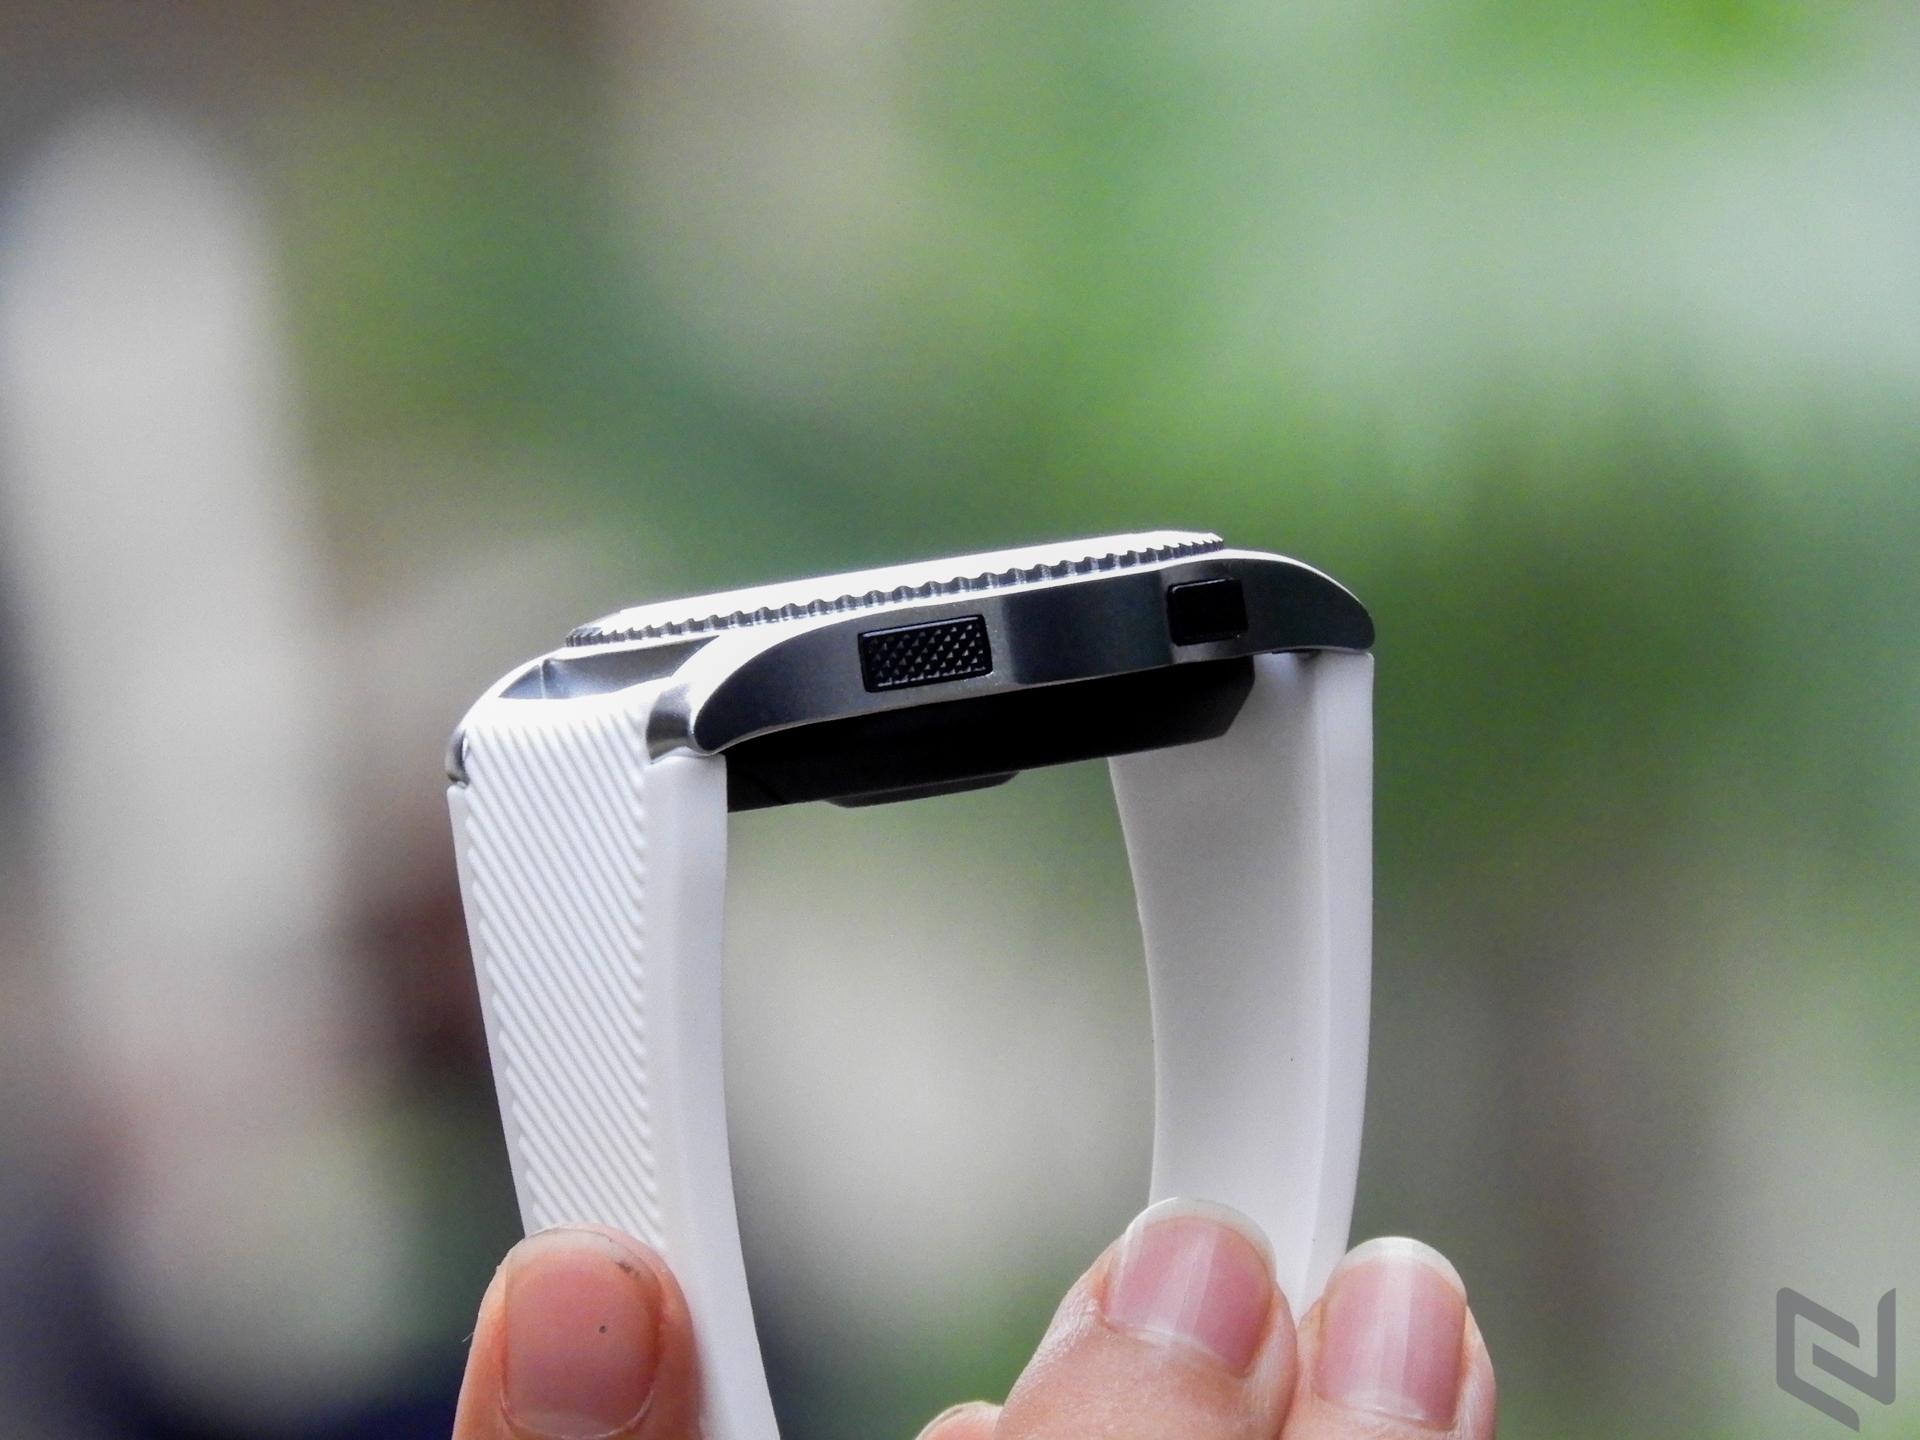 Đánh giá: Smartwatch DT No.1 G8